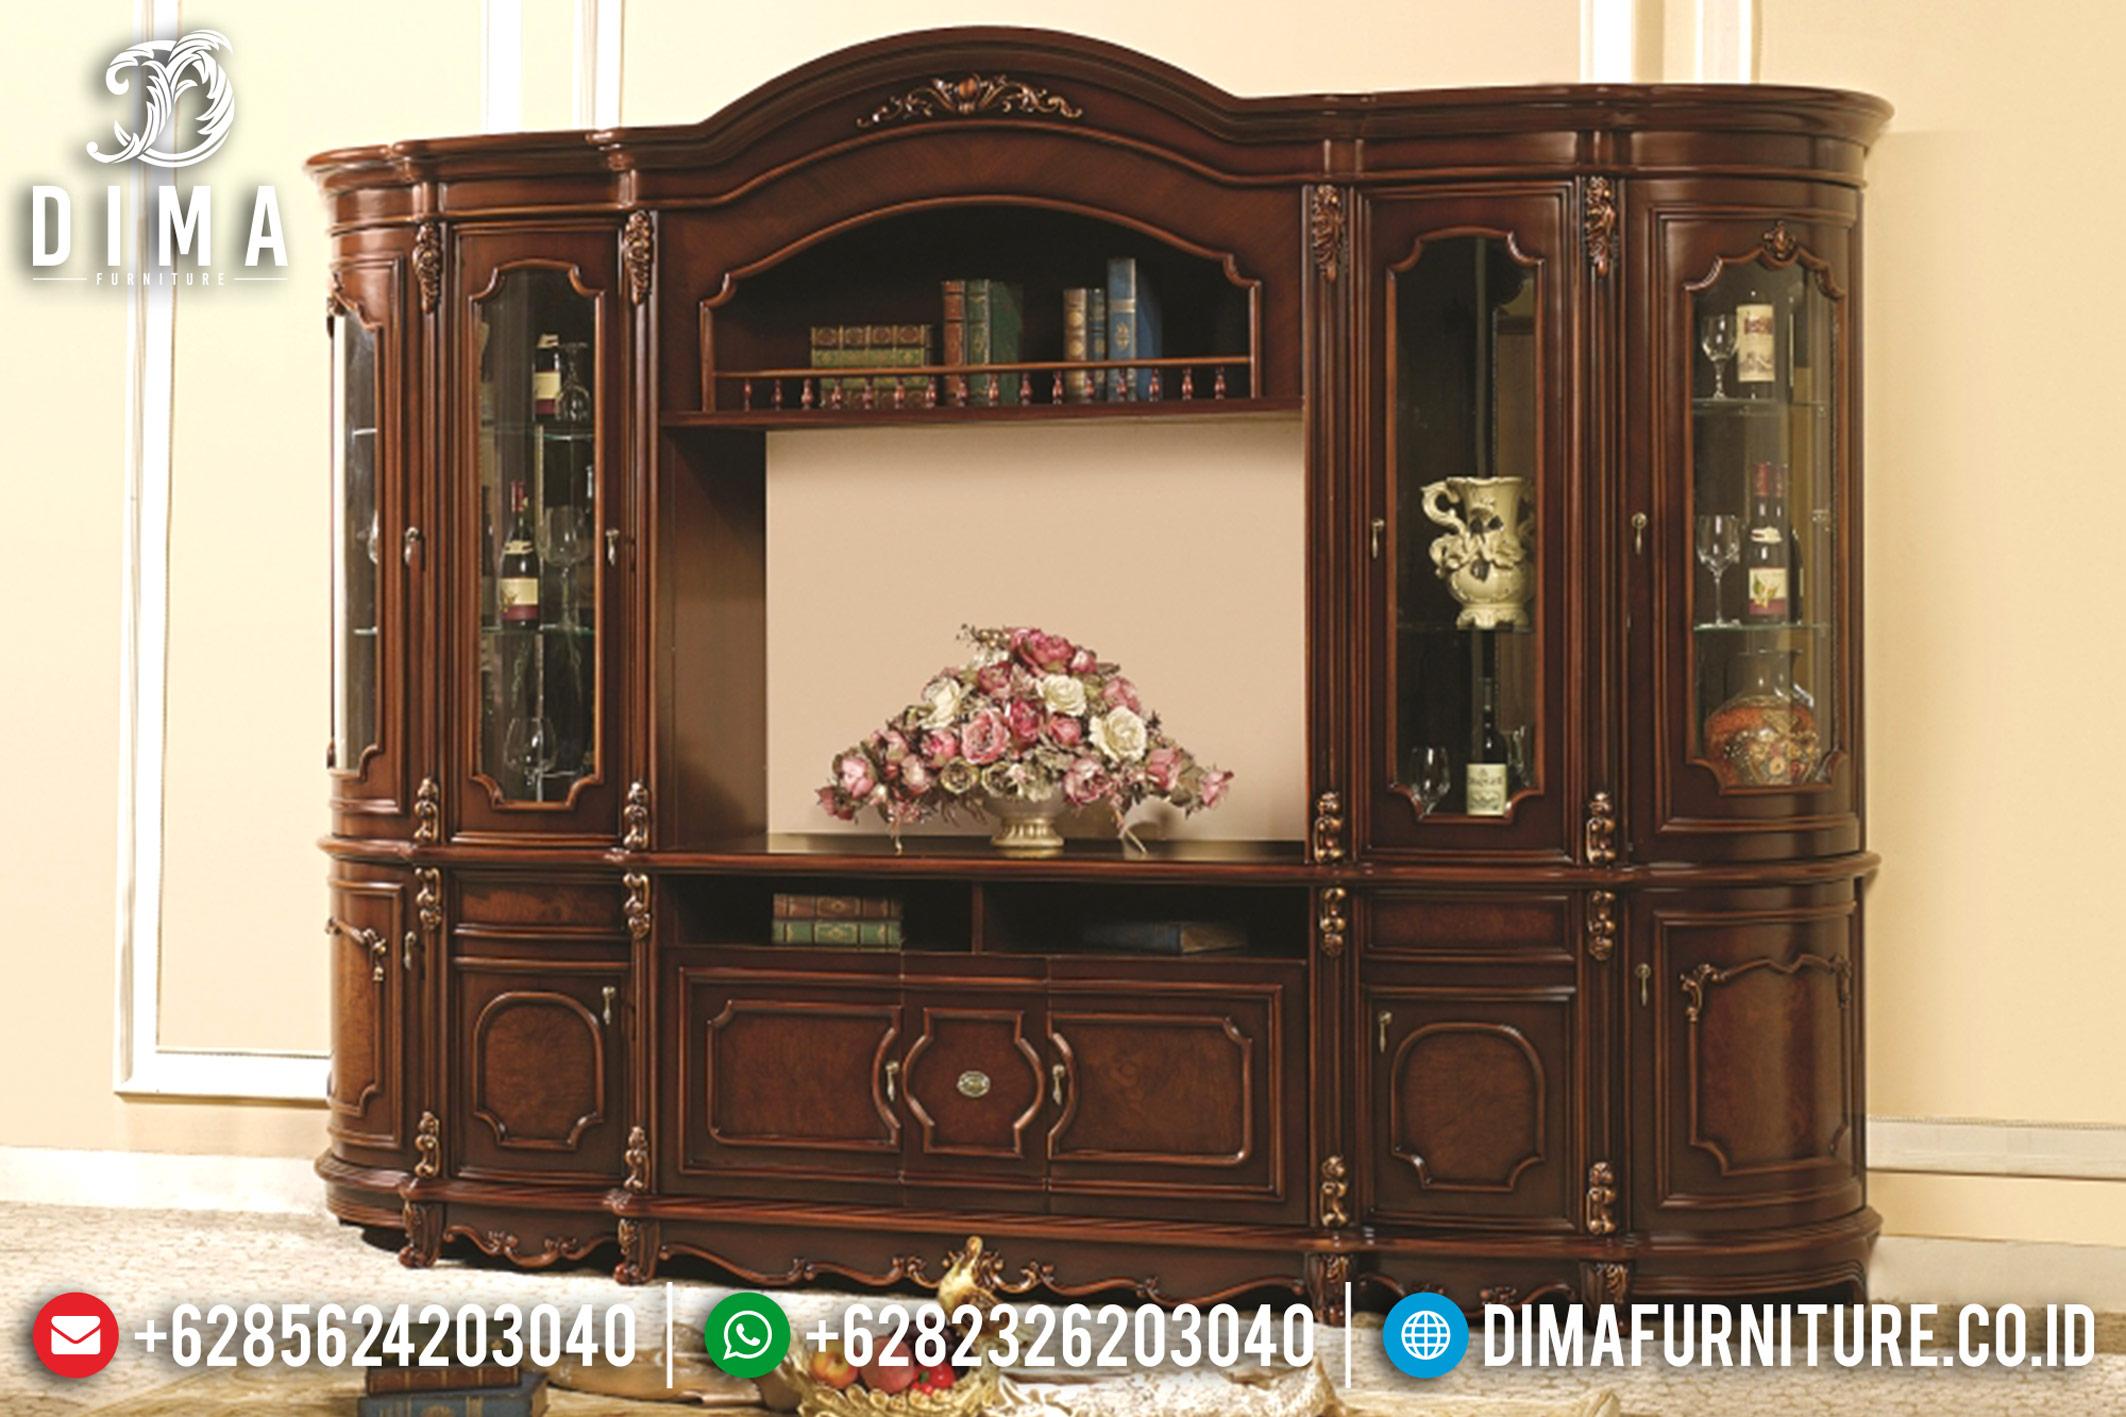 Bufet TV Jepara Mewah Model Klasik Ukiran Minimalis Victorian DF-0676